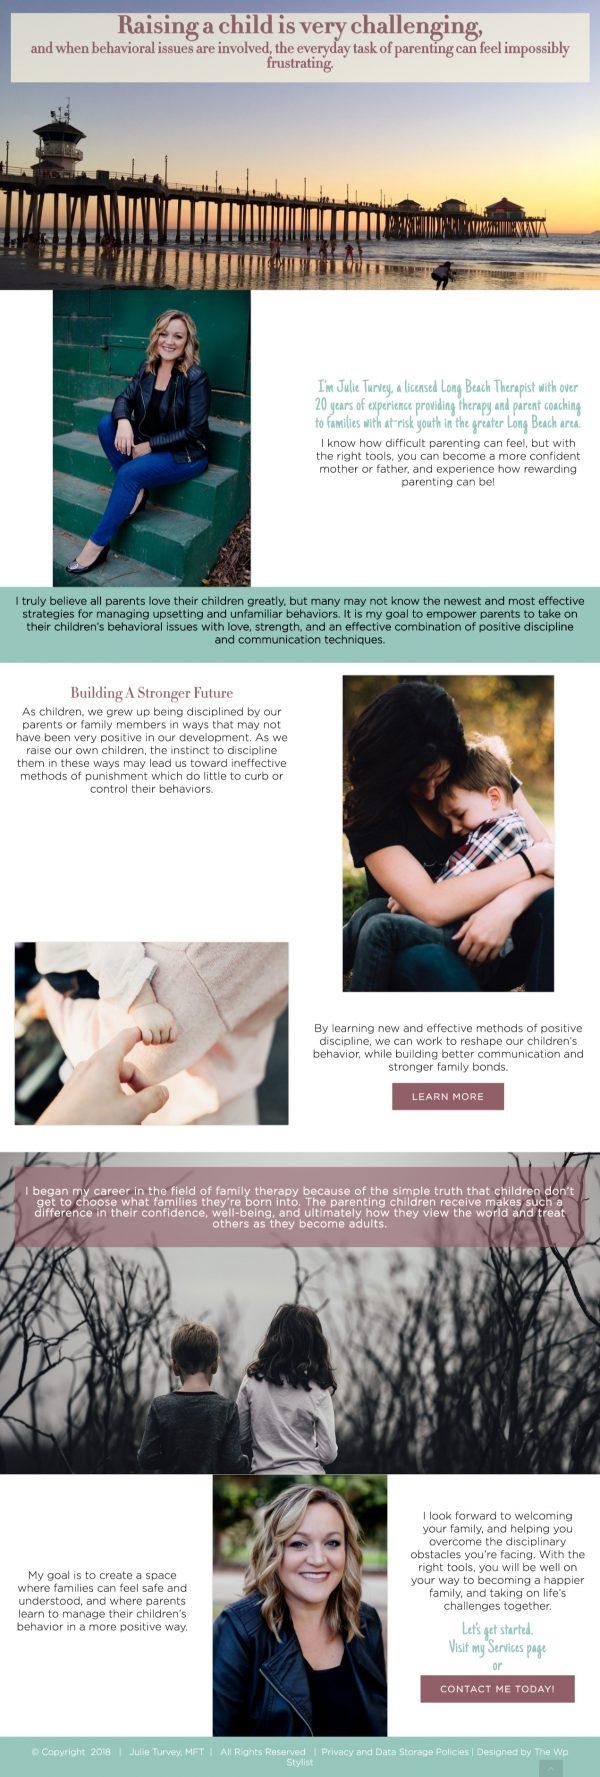 Julie Turvey Website The Wp Stylist - Wordpress Web Design Services